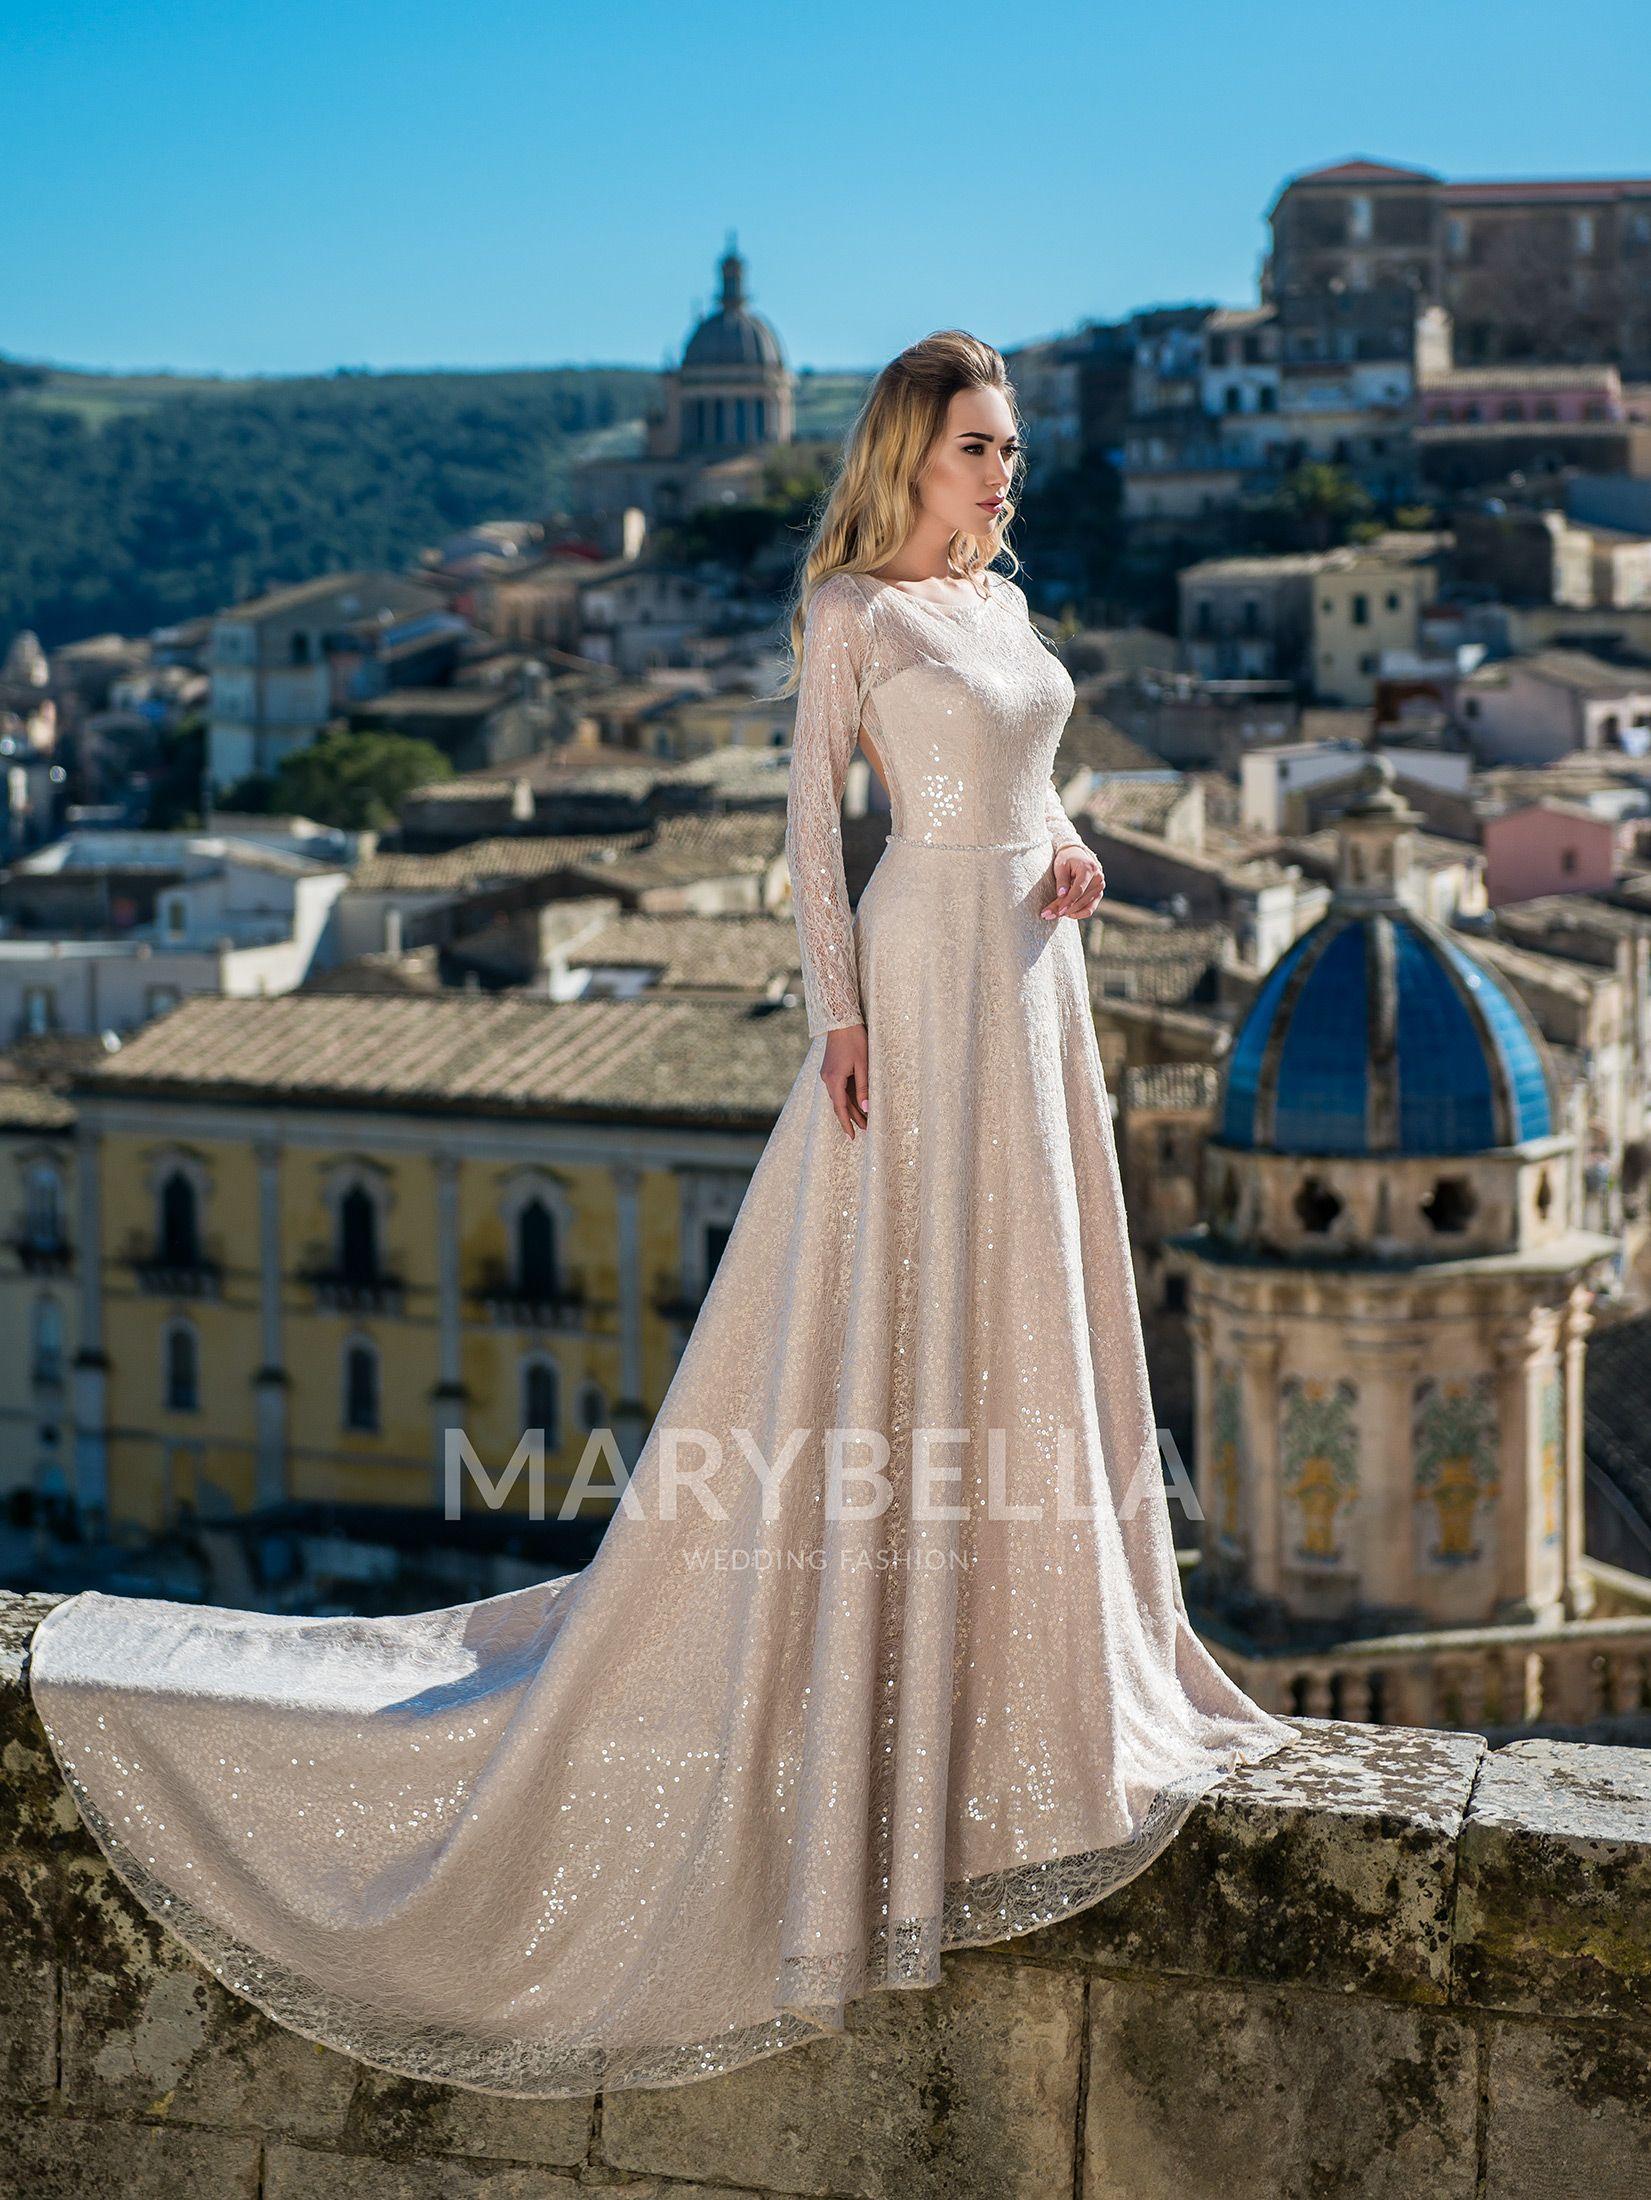 Lace wedding dress under 300  Marbella wedding dress in Charmé Gaby wedding dresses boutique in